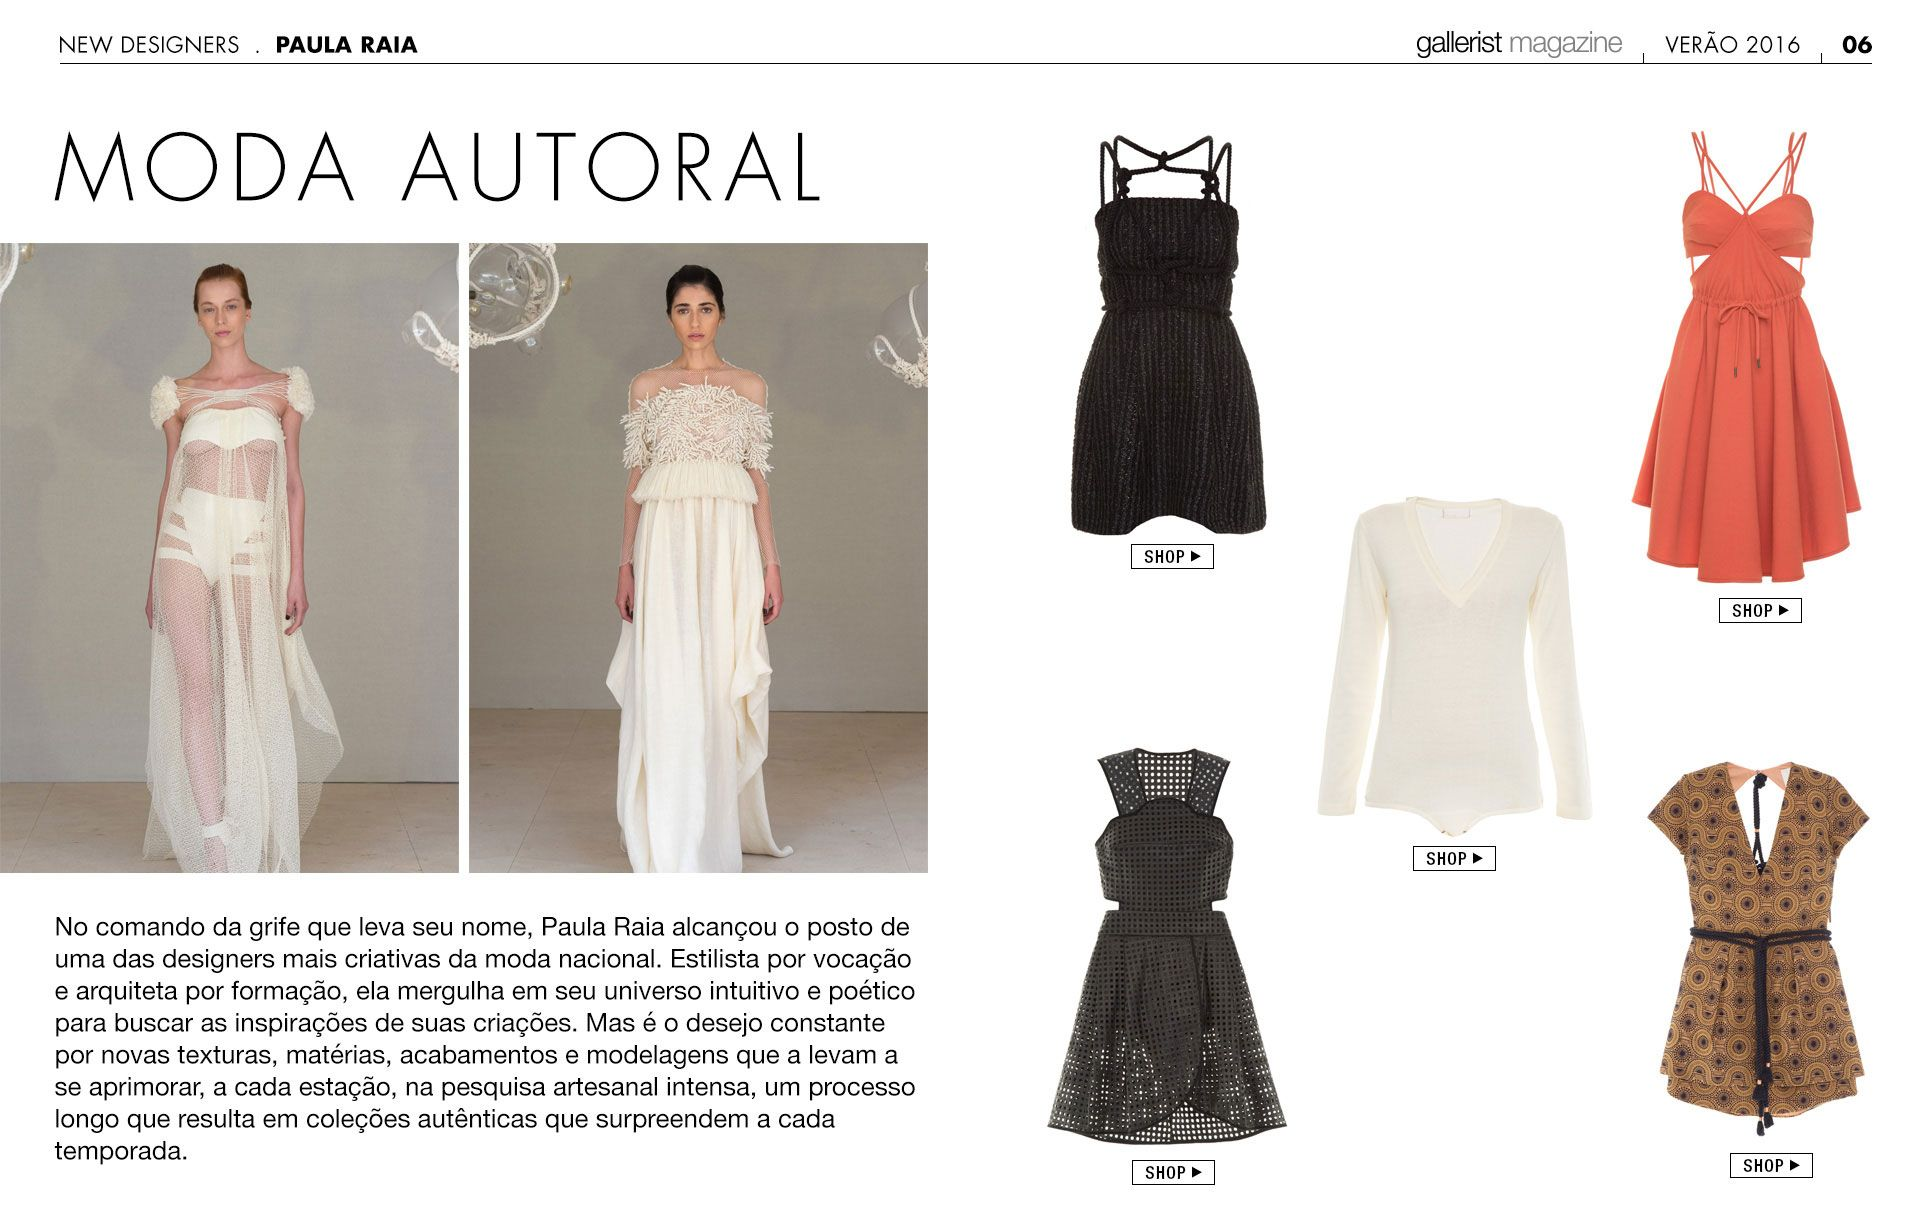 New designers: Paula Raia na Gallerist Mag Issue #5